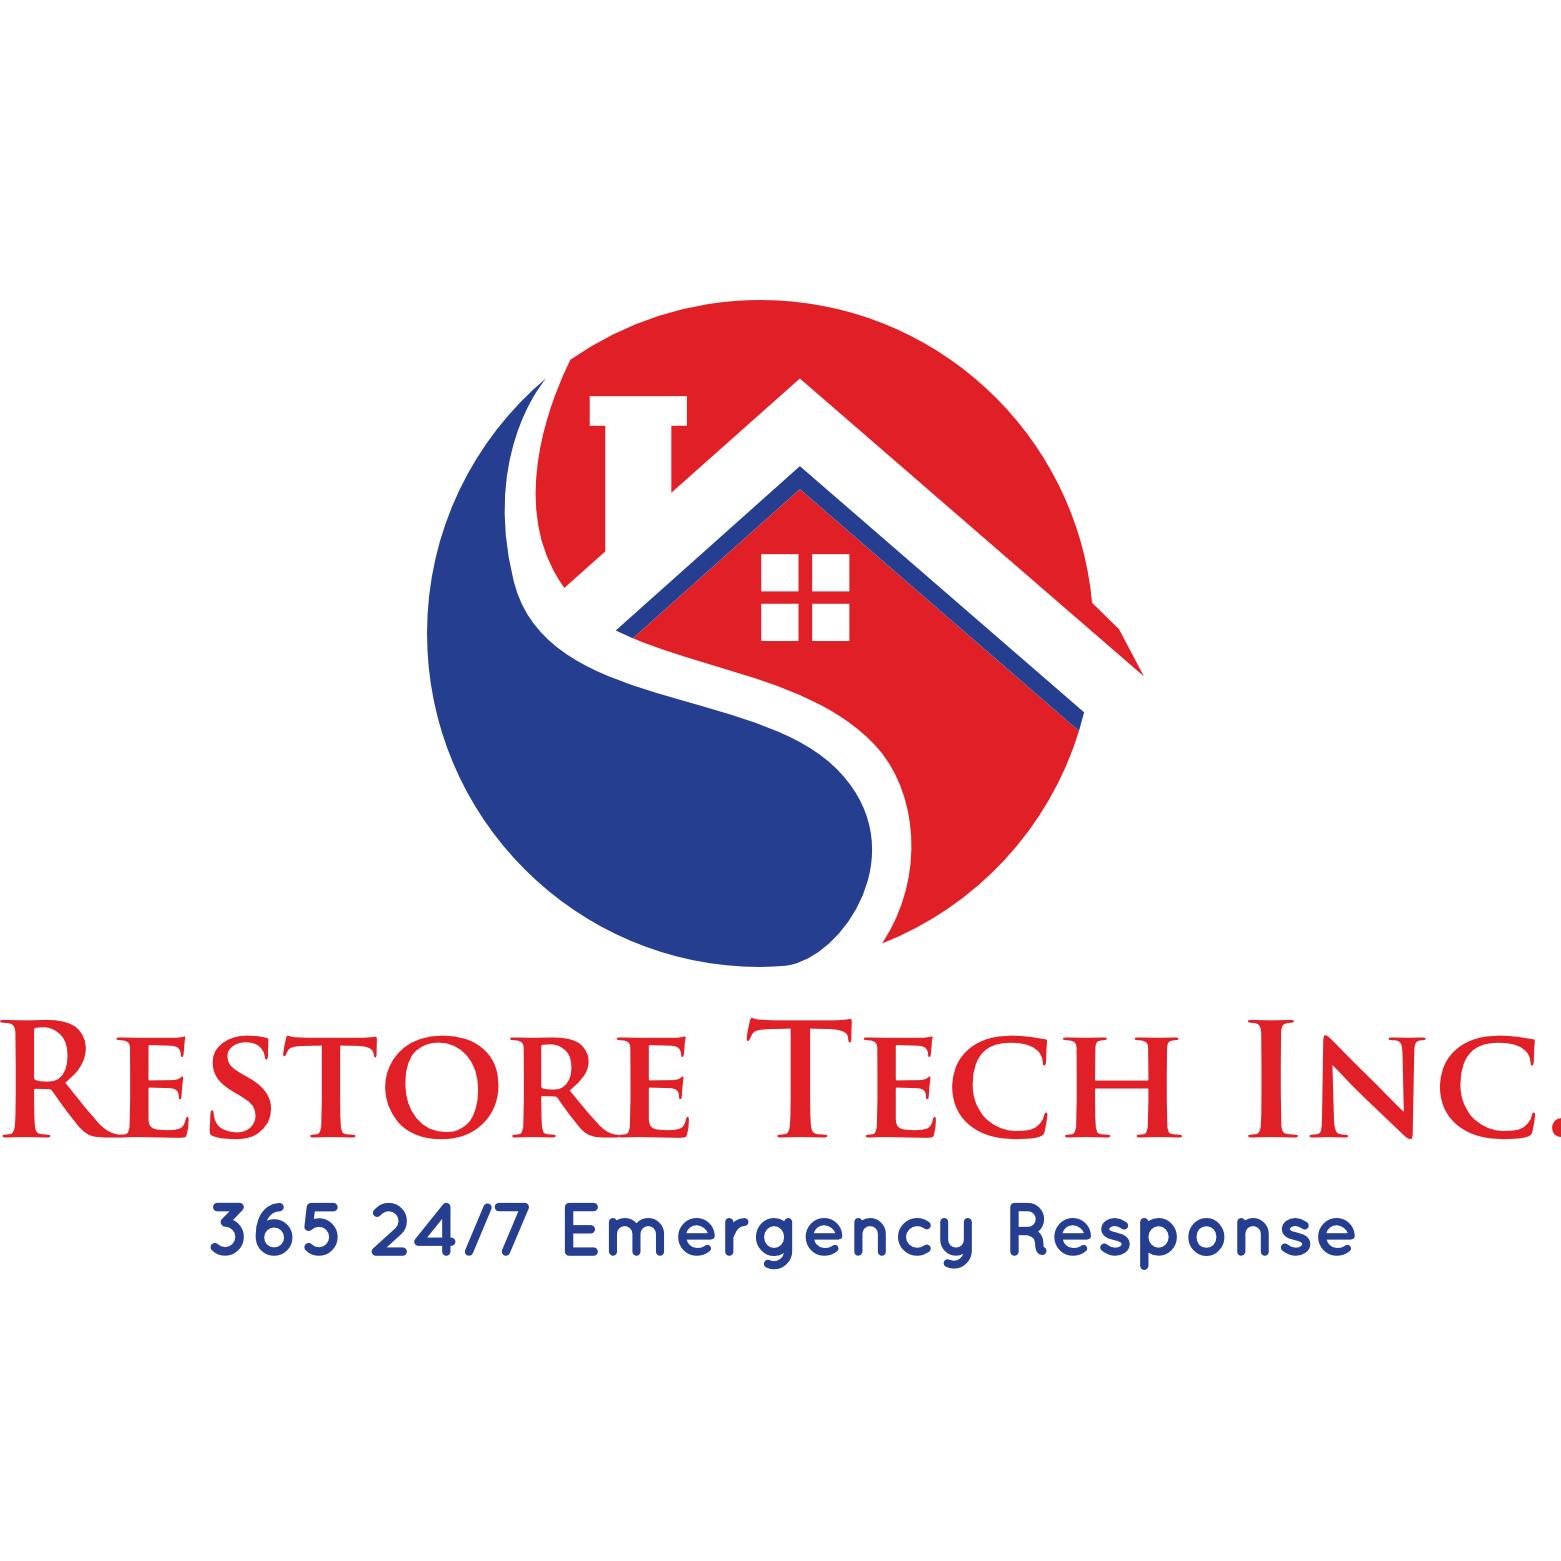 Restore Tech Inc